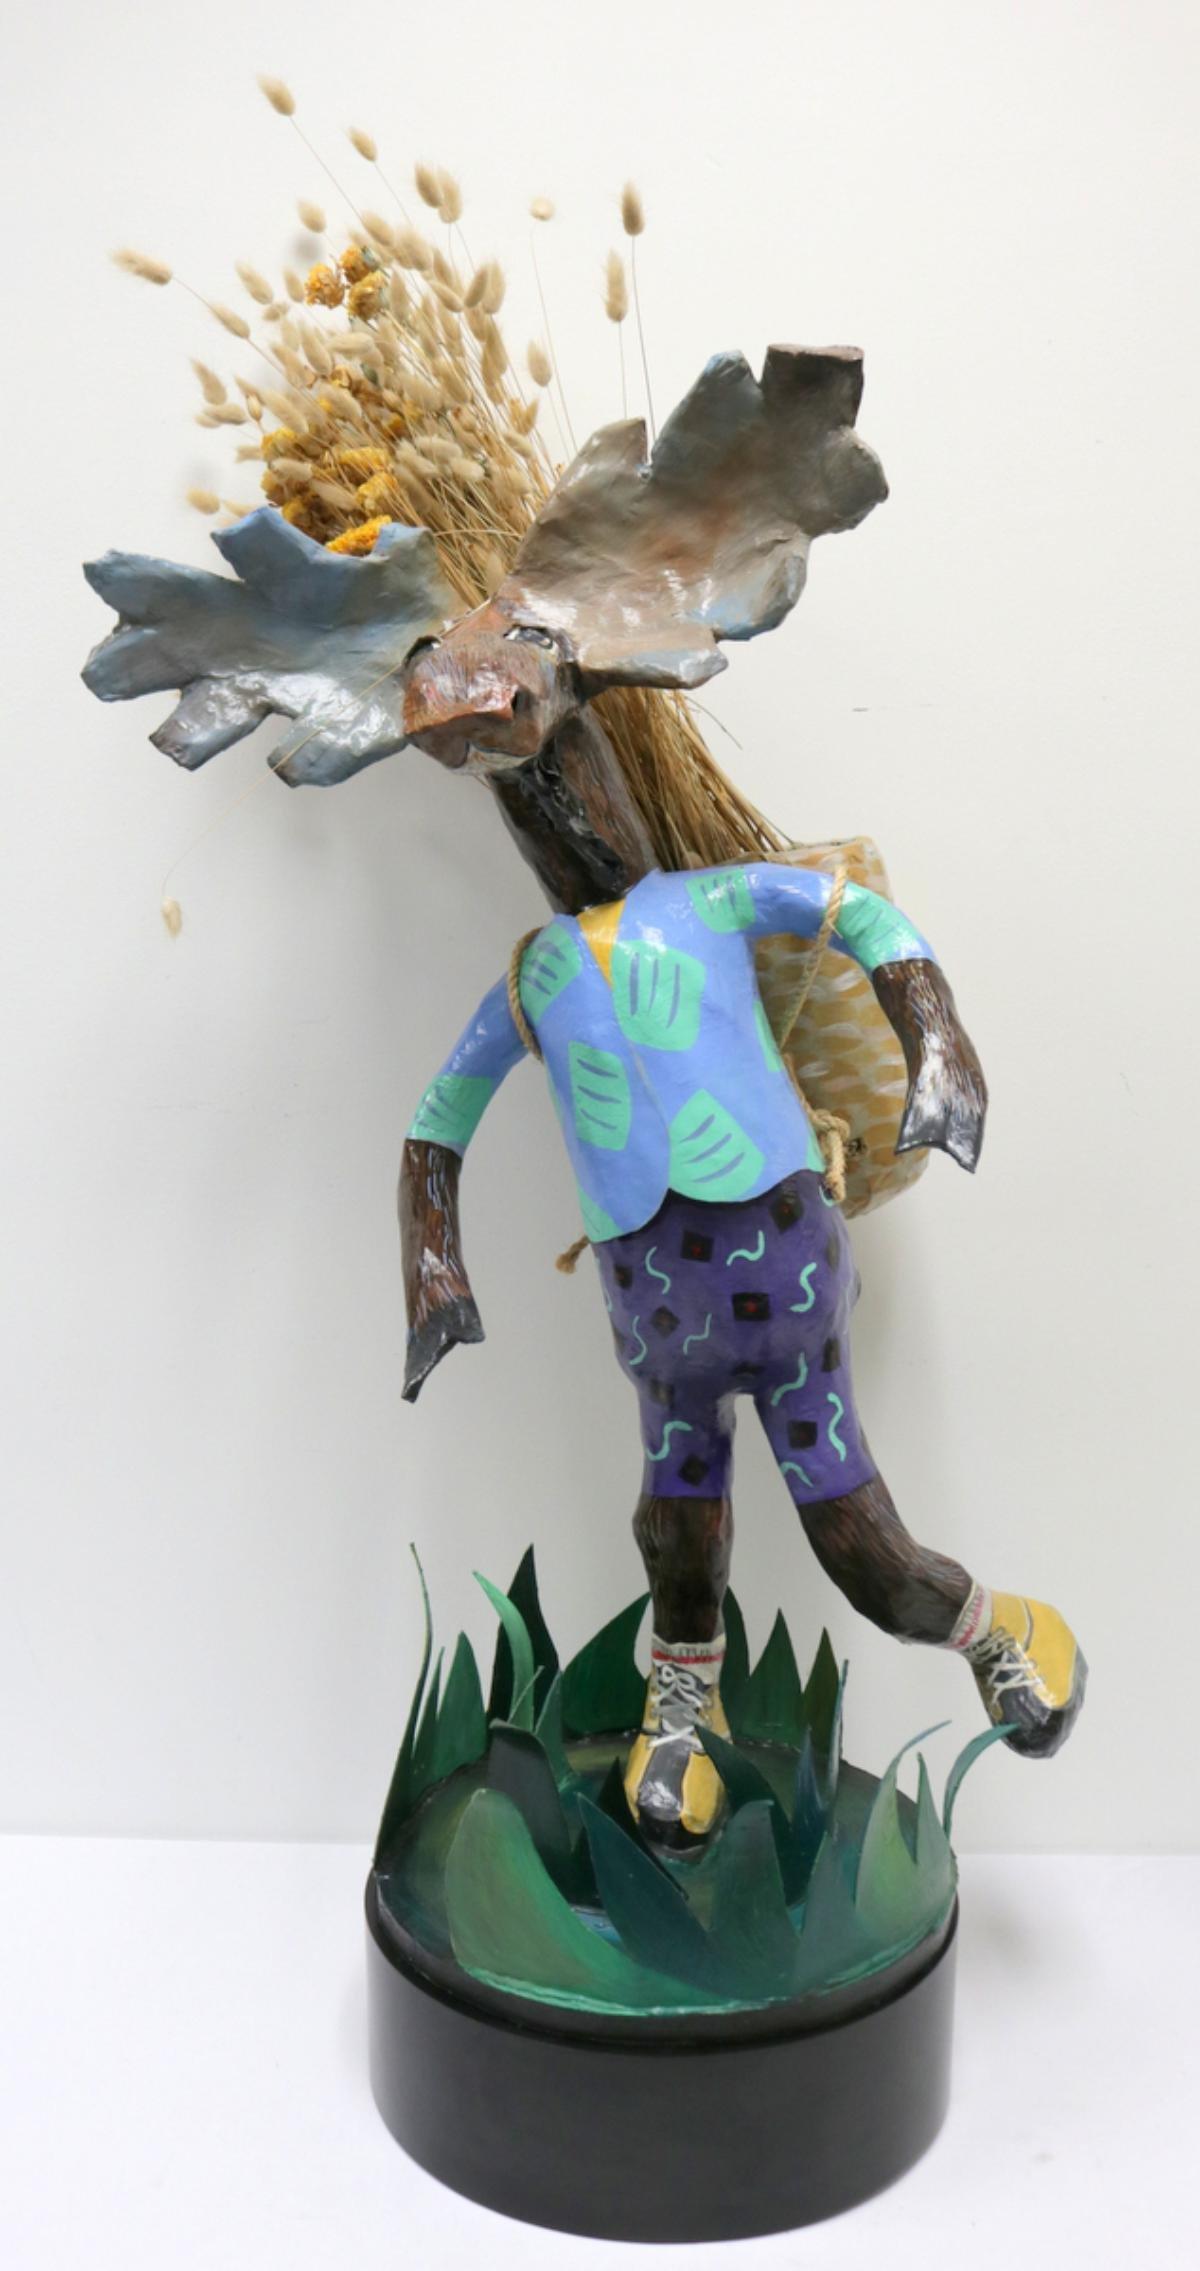 Whimsical Paper Mache Moose Sculpture